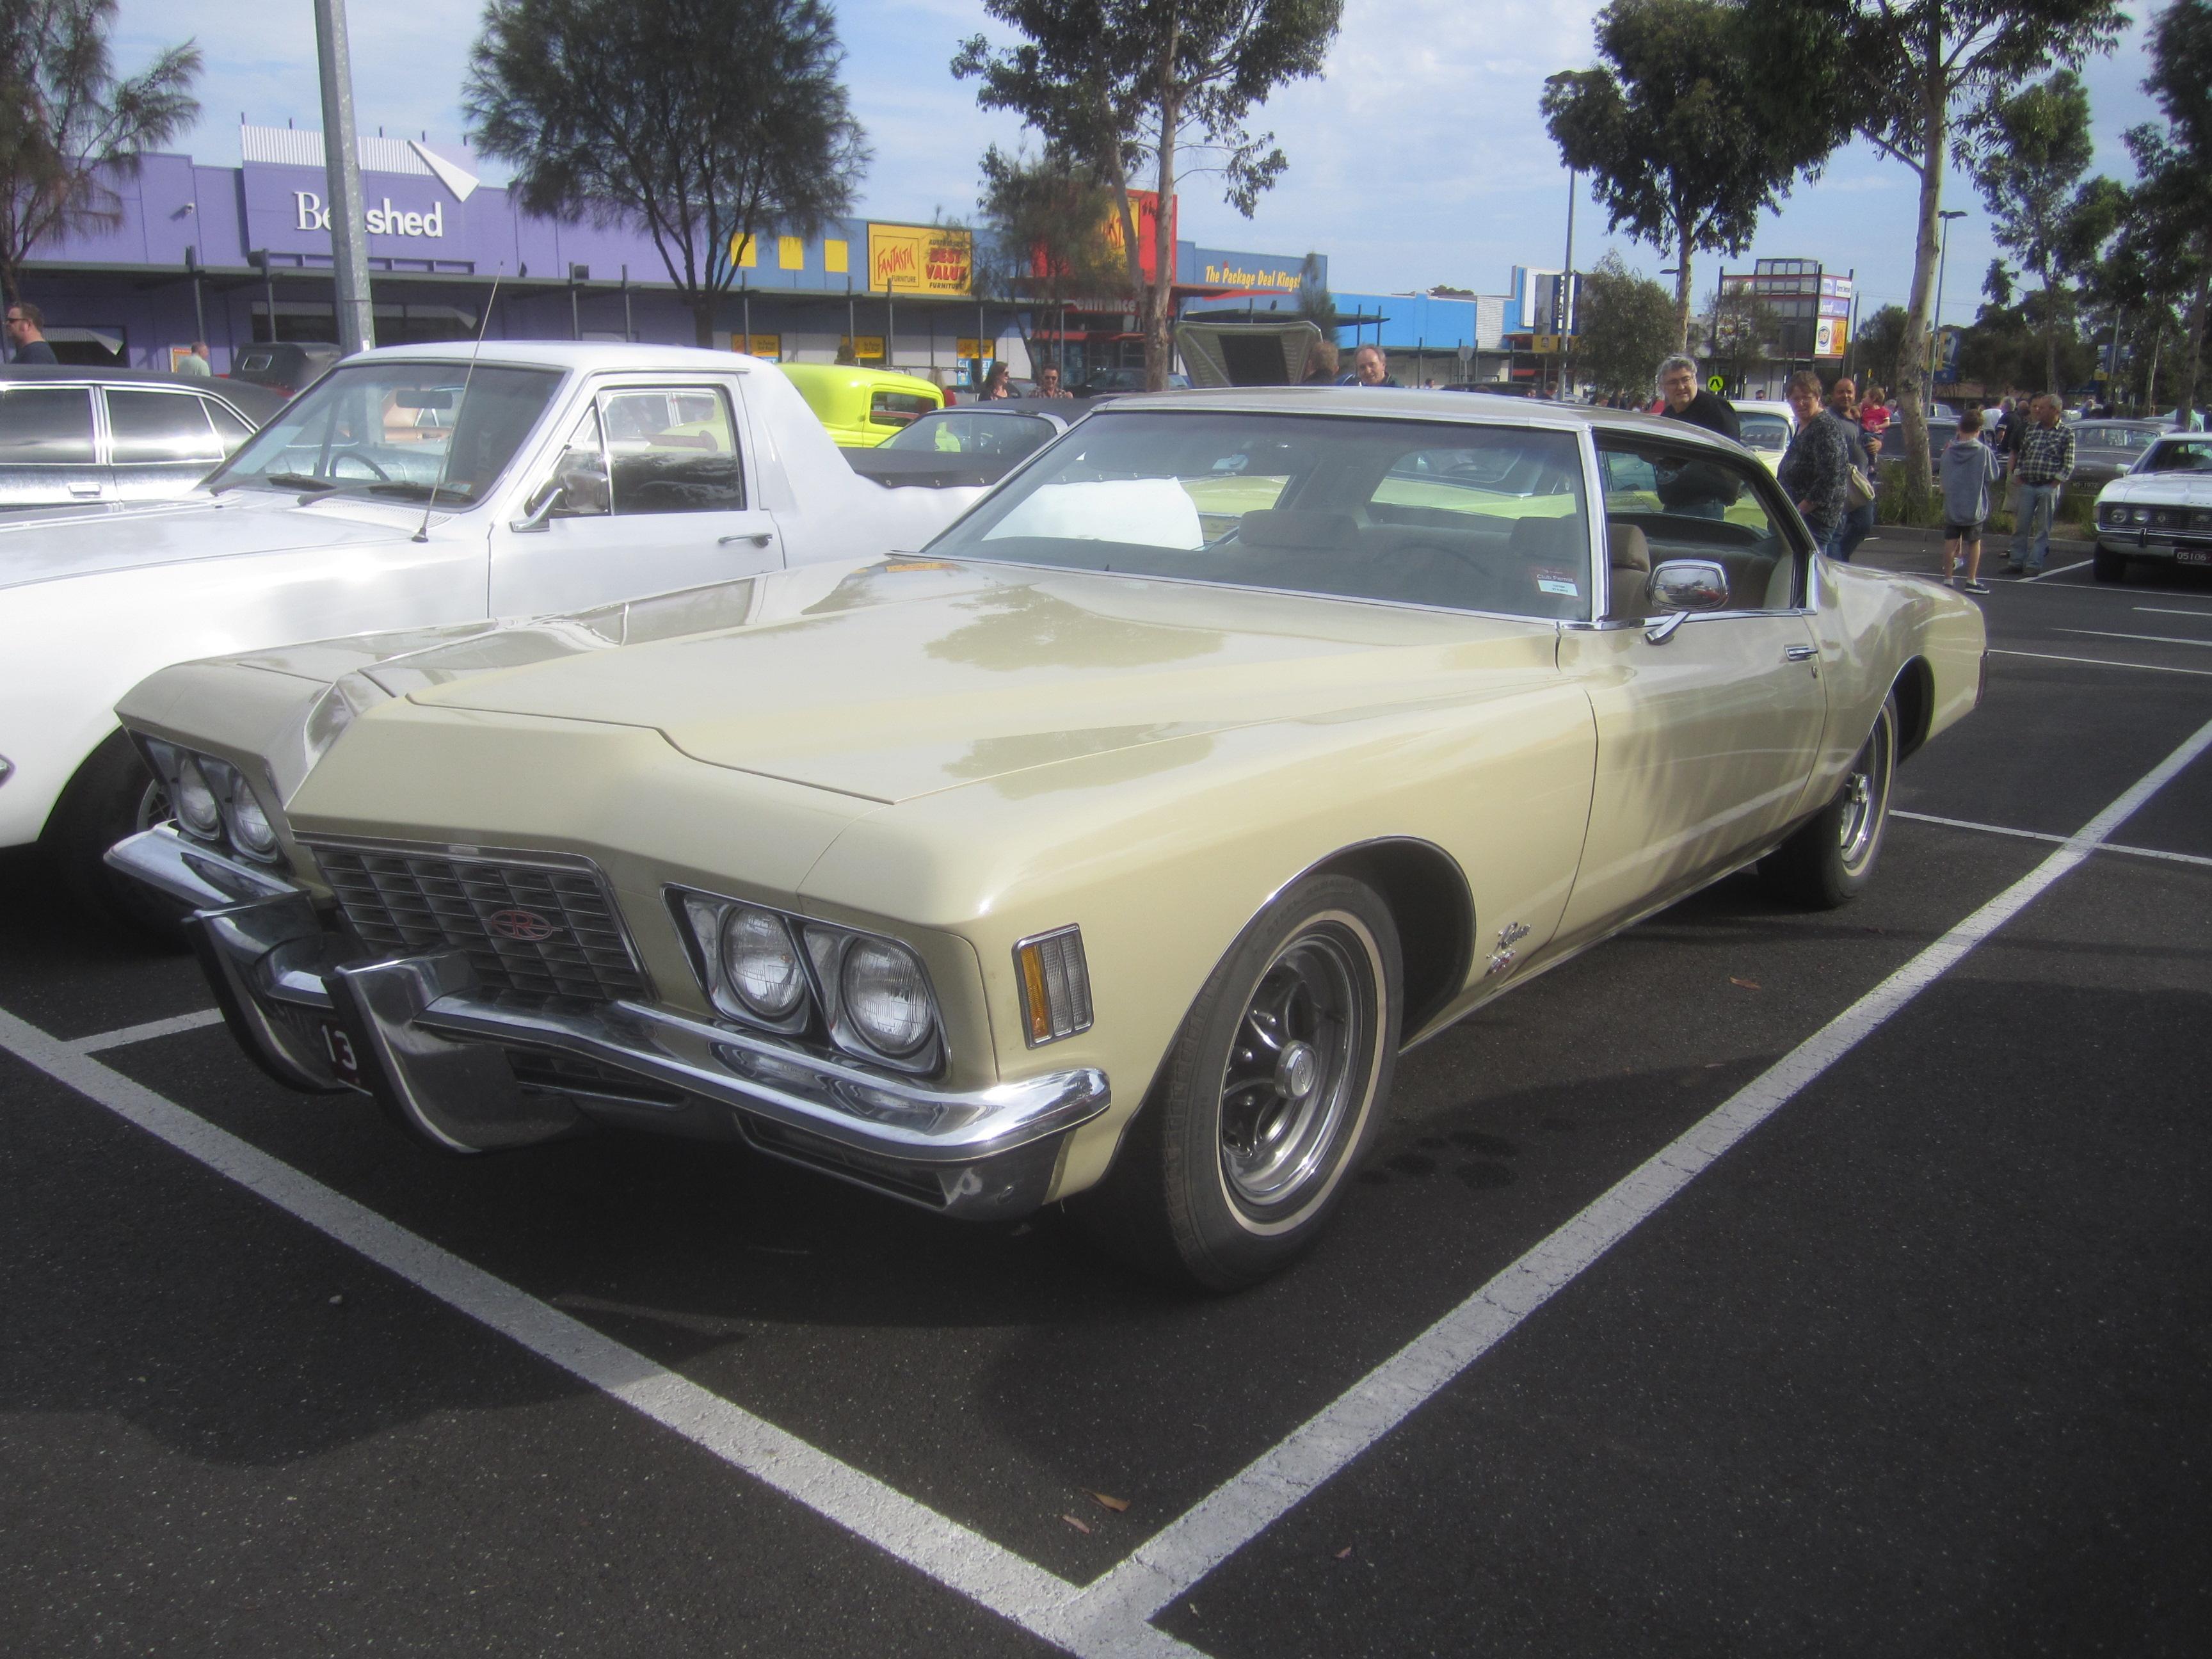 File:1972 Buick Riviera GS Hardtop.jpg - Wikimedia Commons